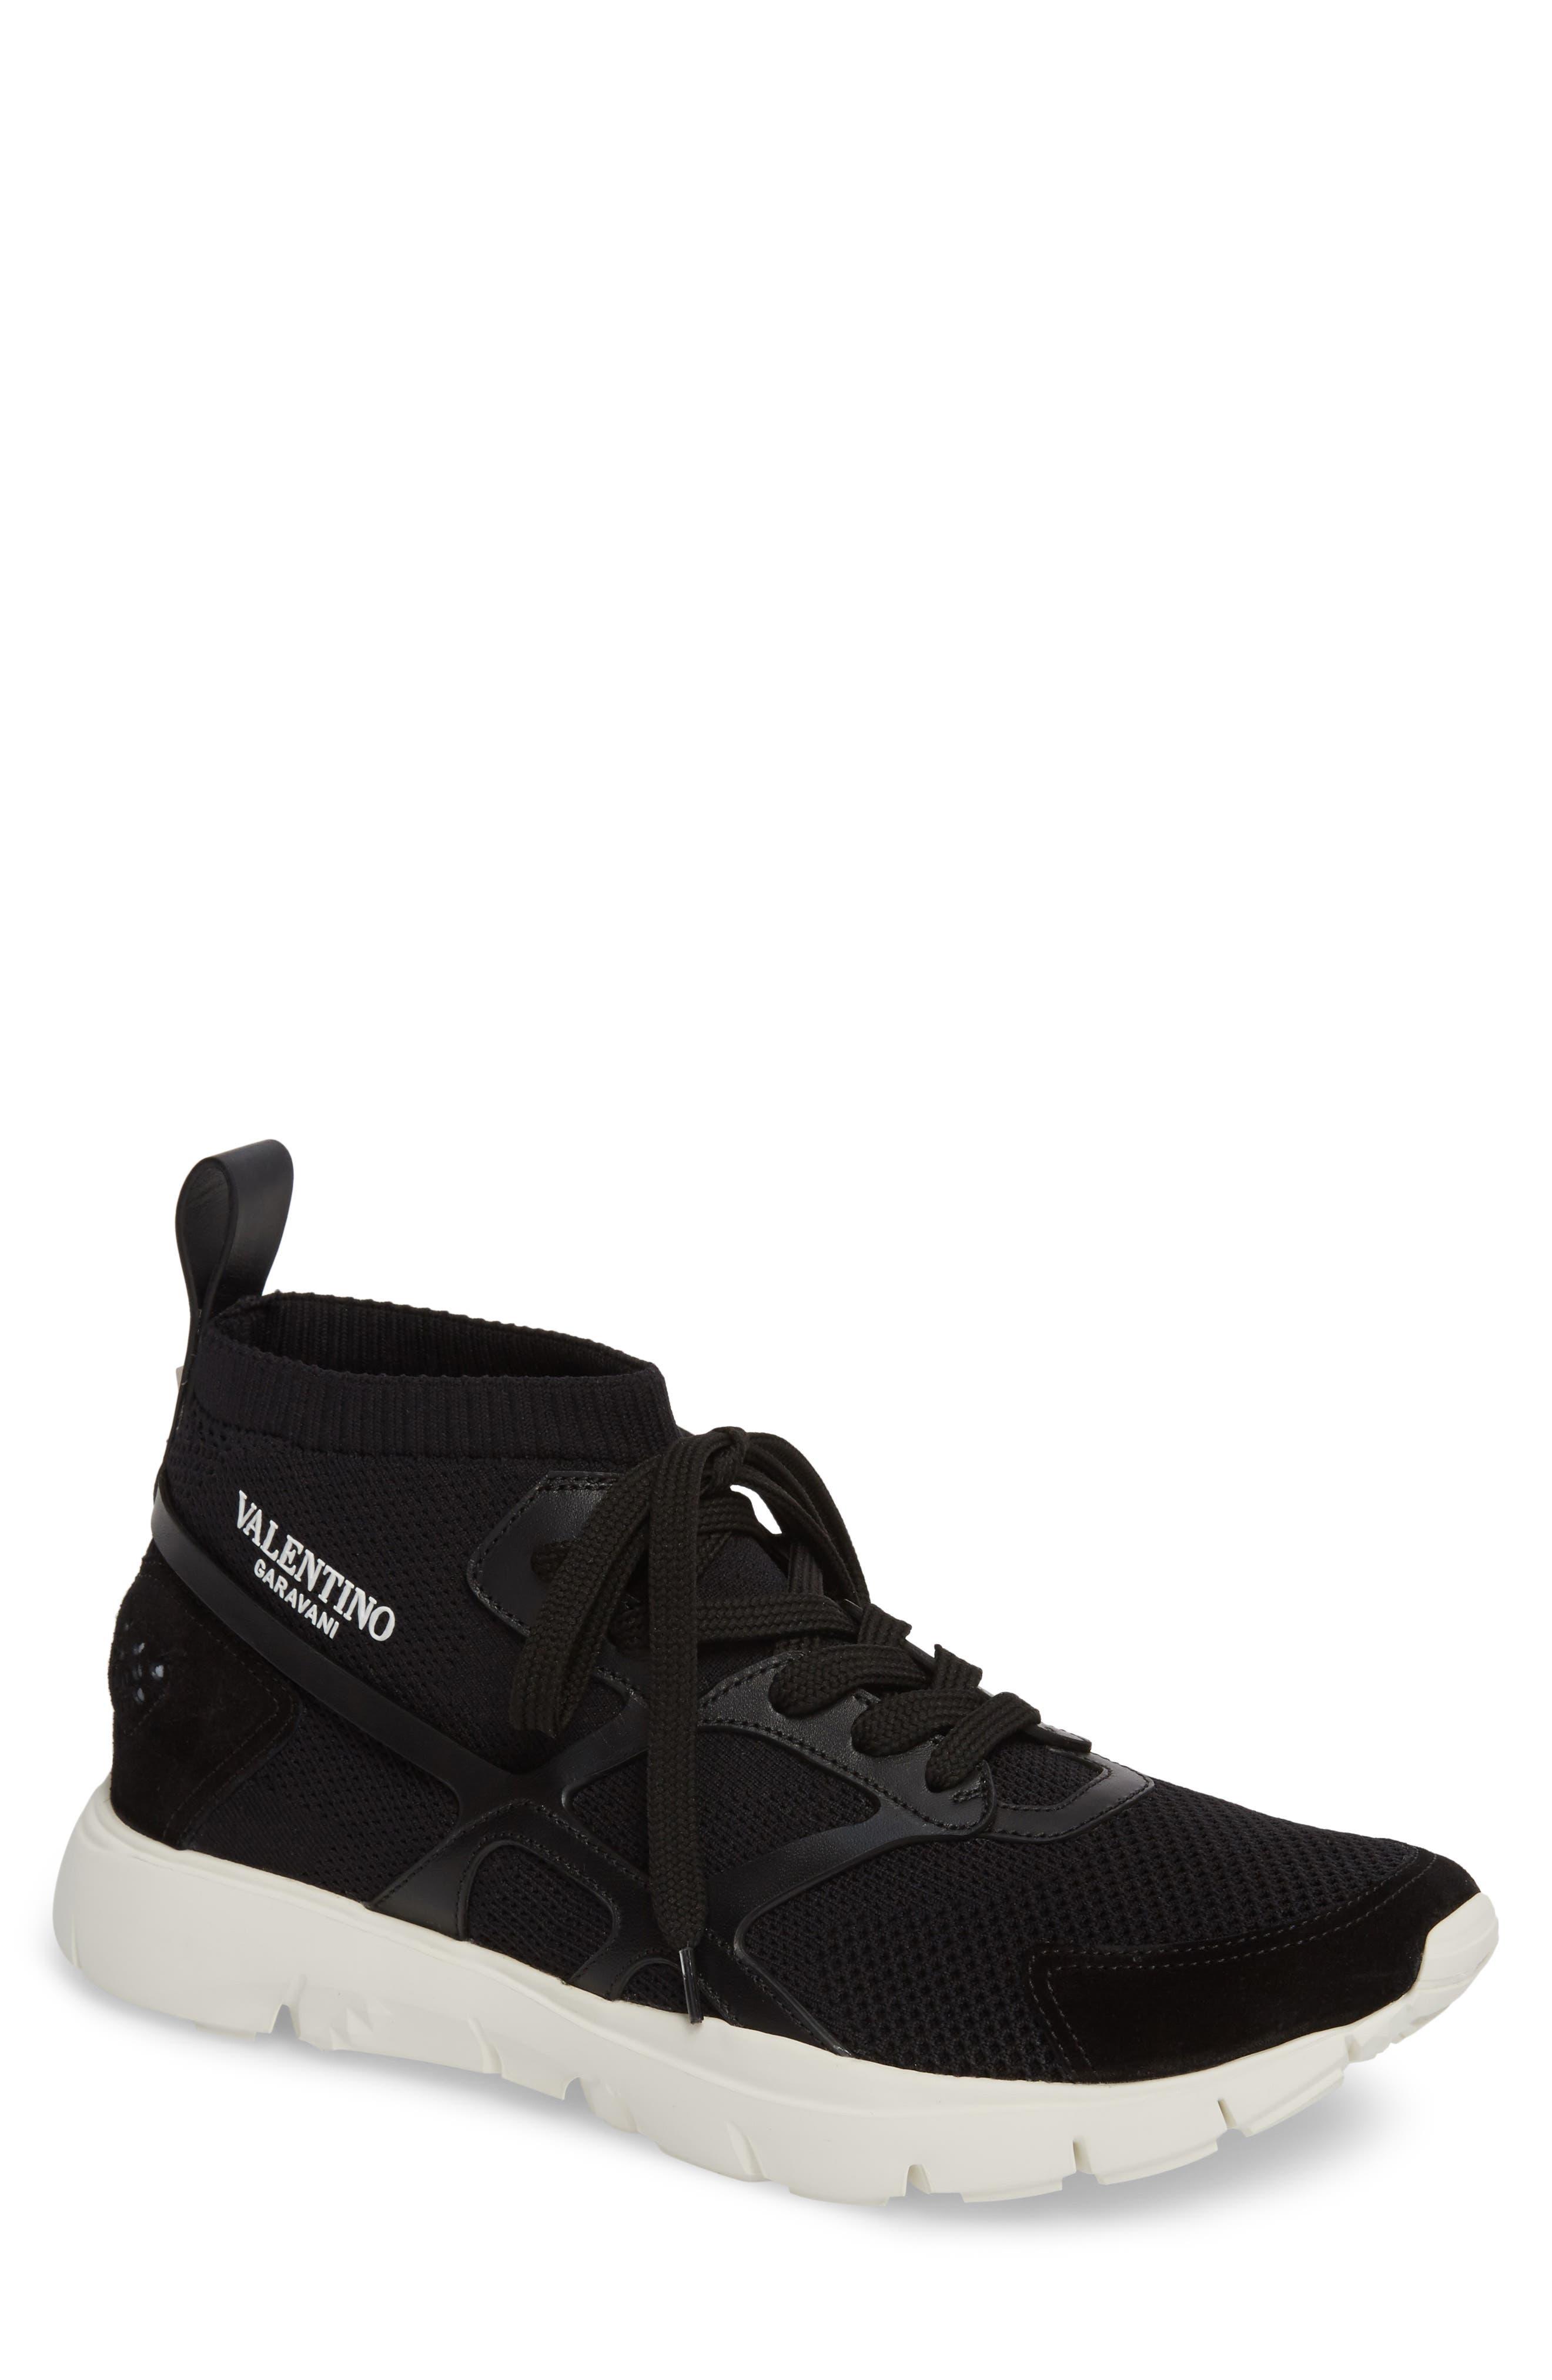 Sound High Sneaker,                             Main thumbnail 1, color,                             Nero